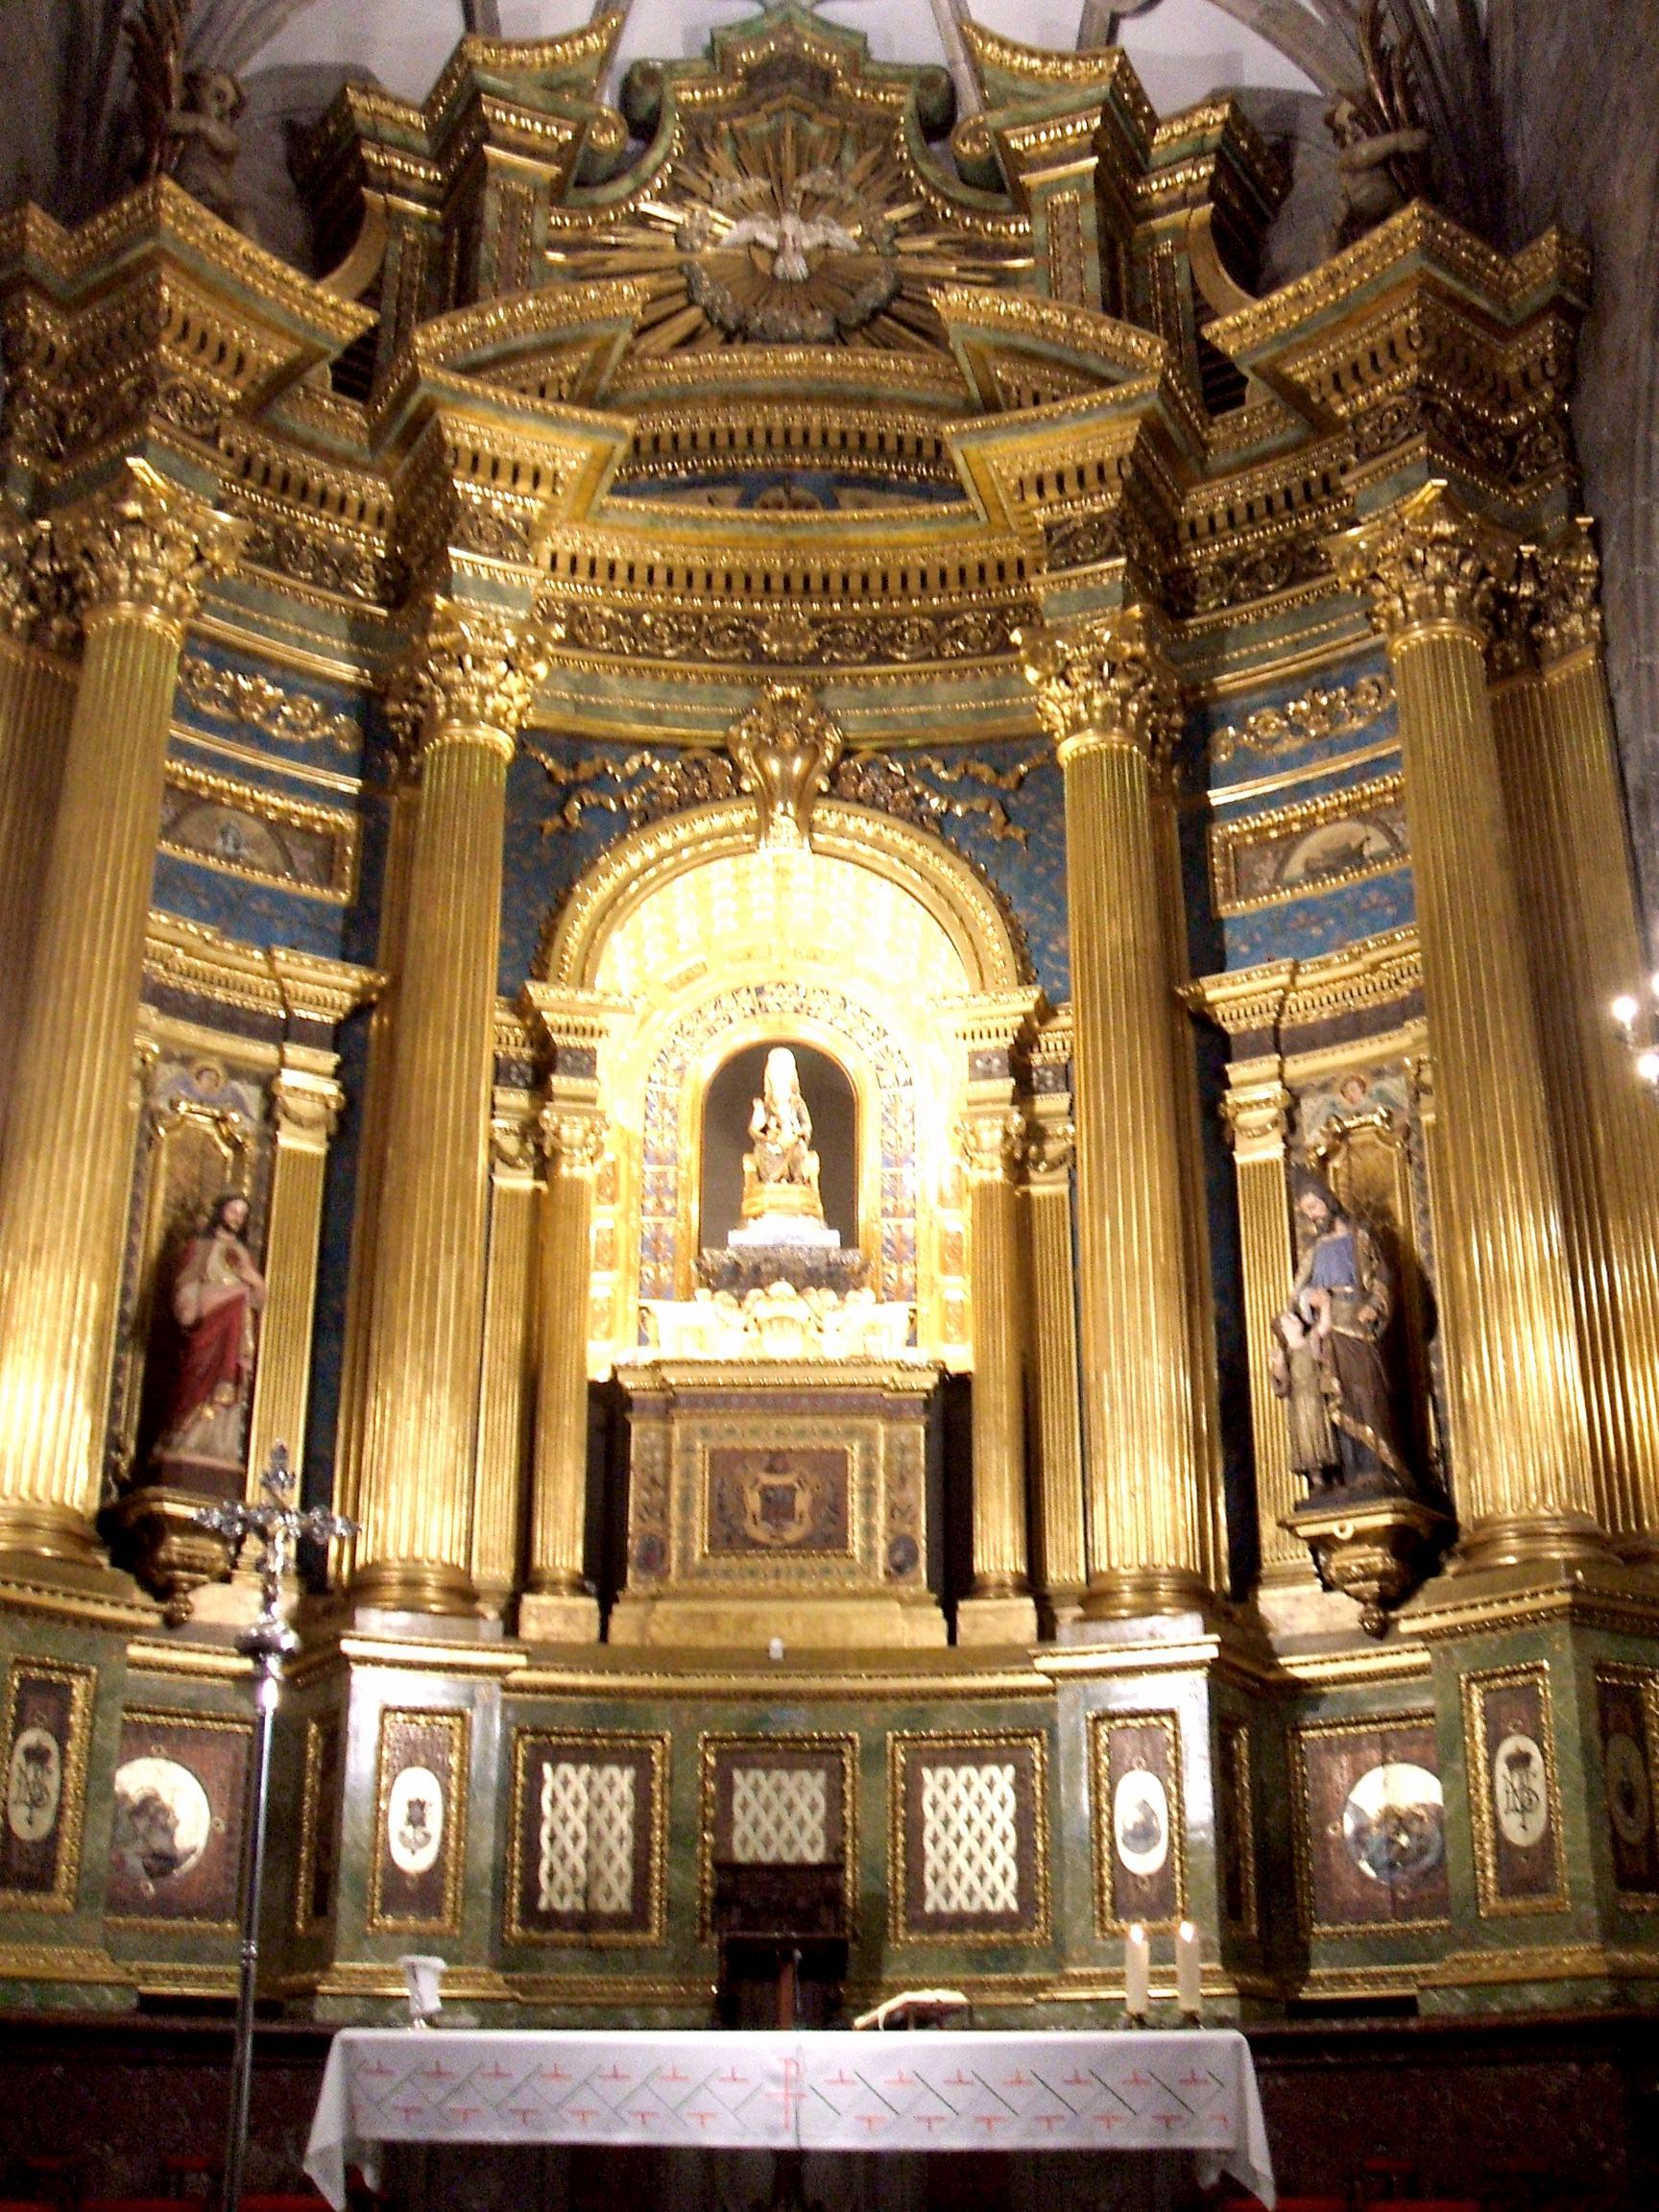 File:Bilbao - Basilica de Begoña 21.JPG - Wikimedia Commons